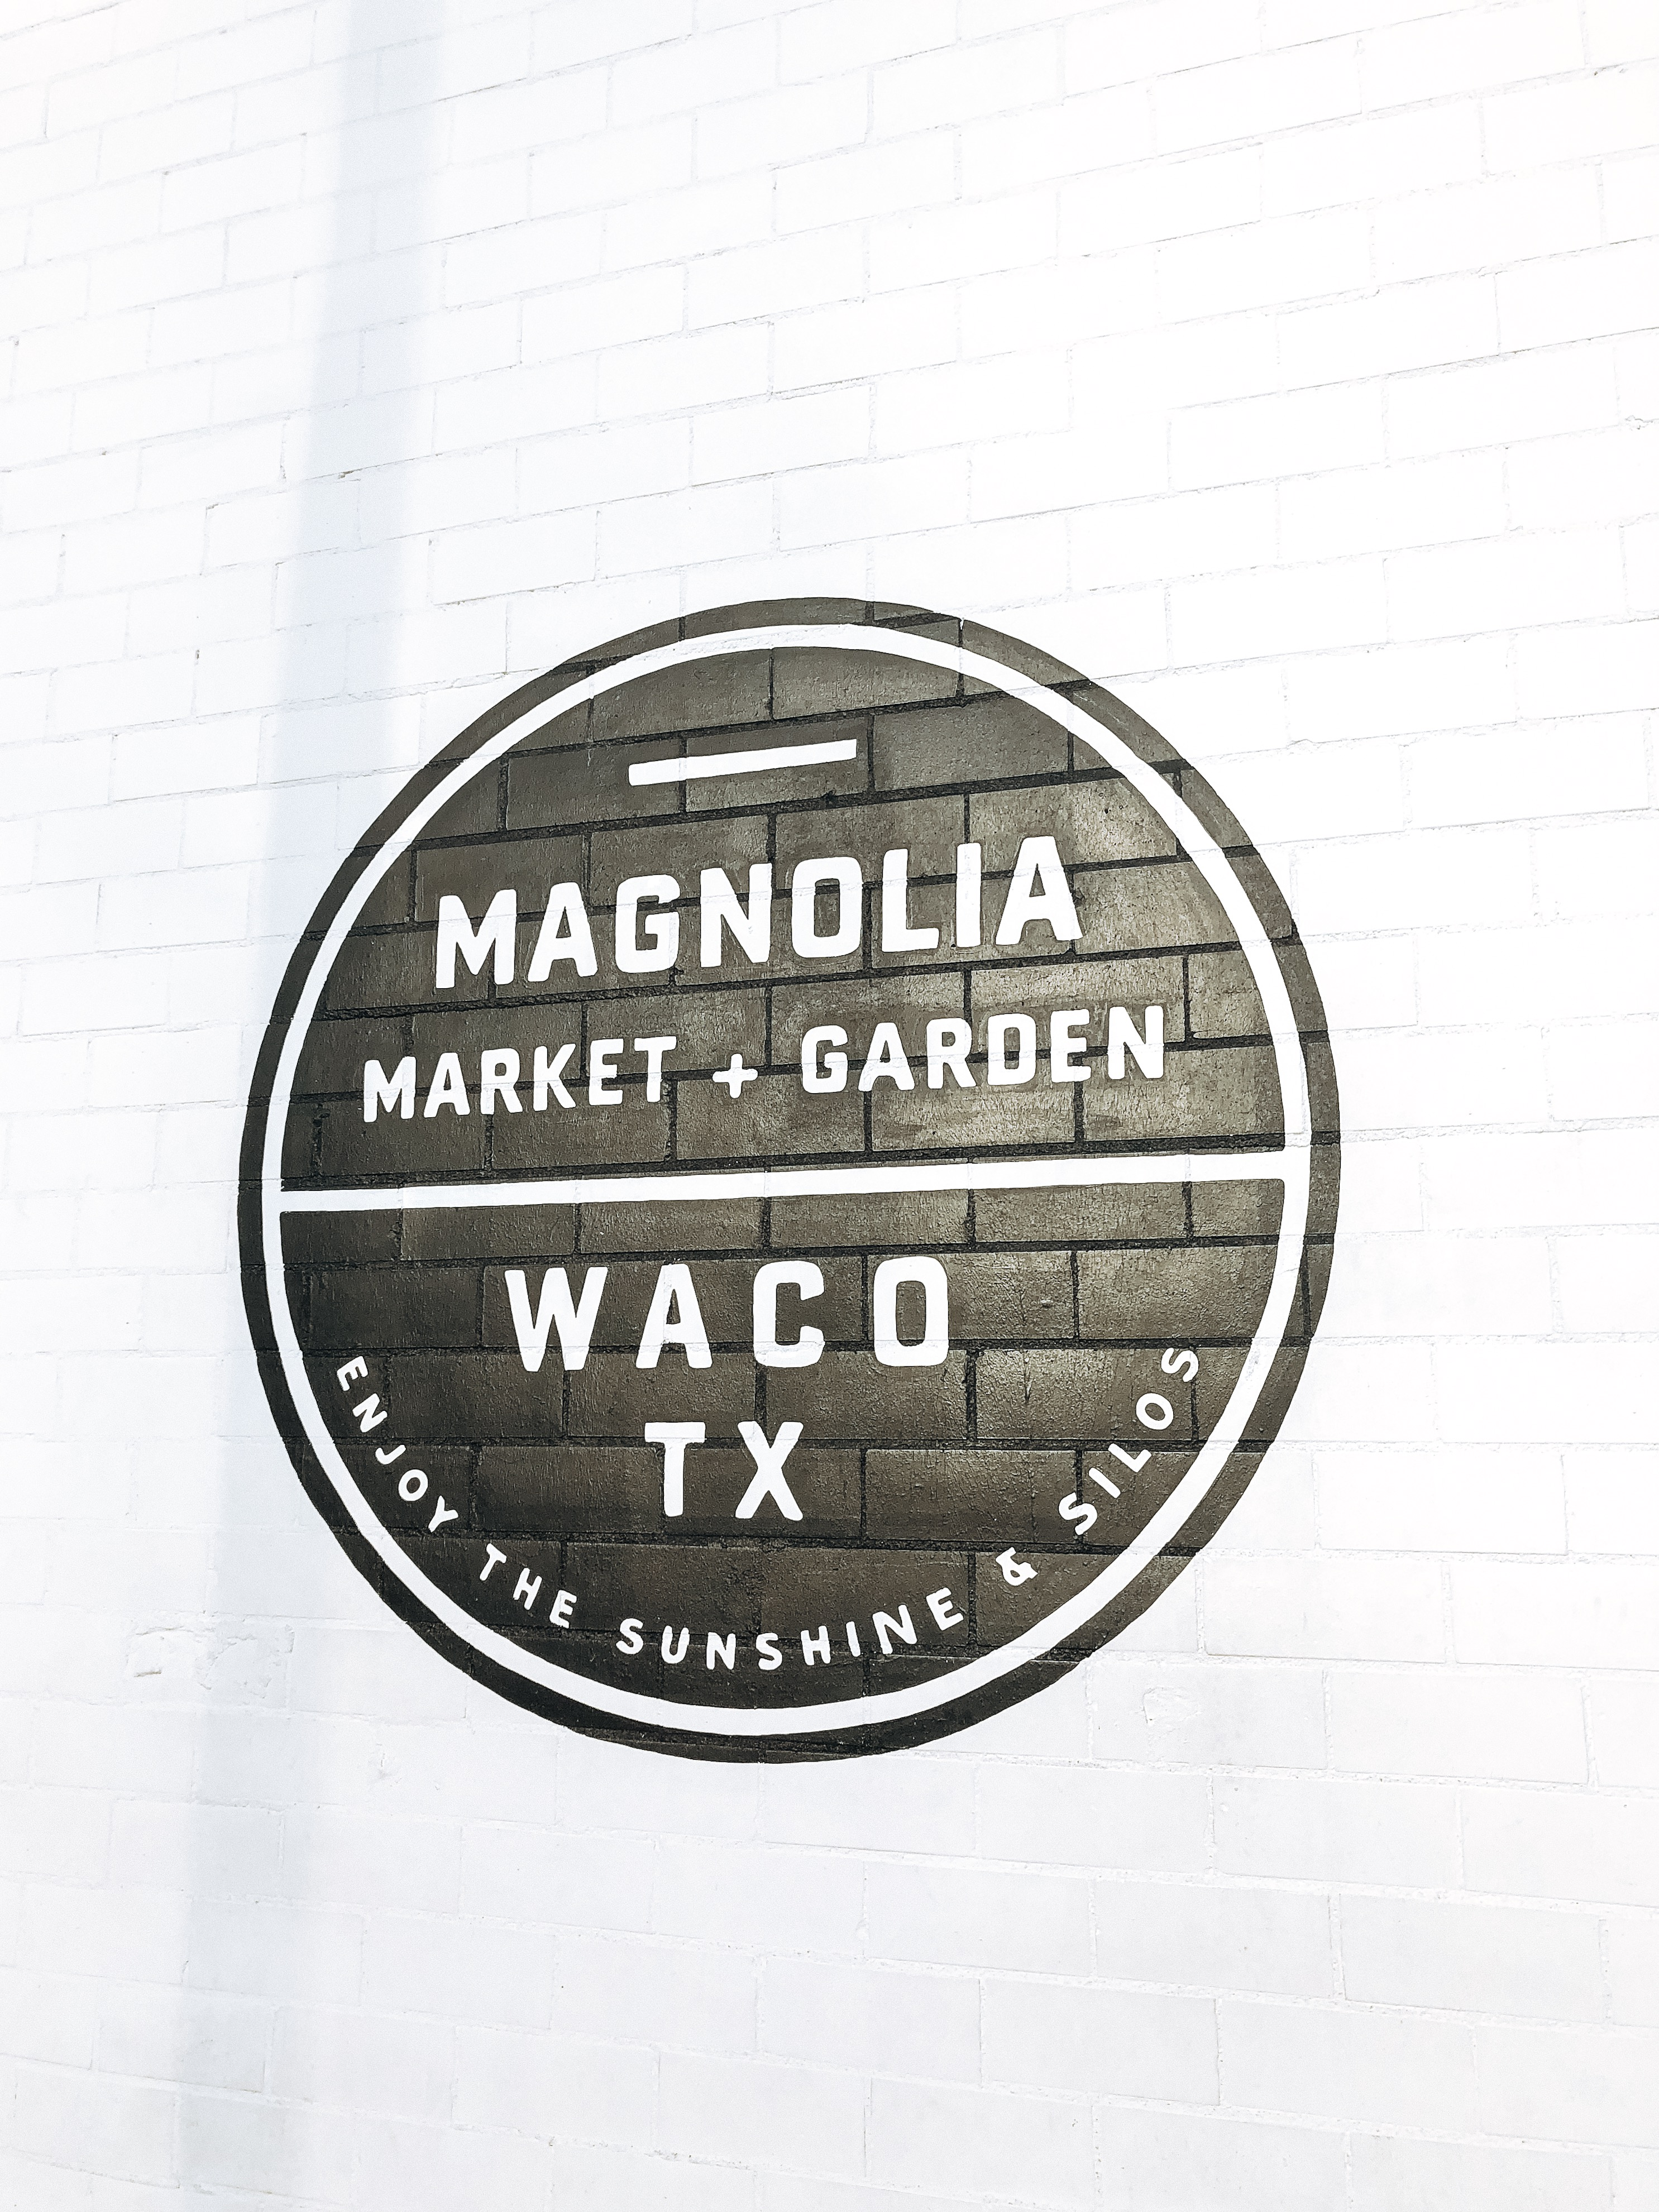 Plan the Best Trip to Magnolia Farms, Waco TX.